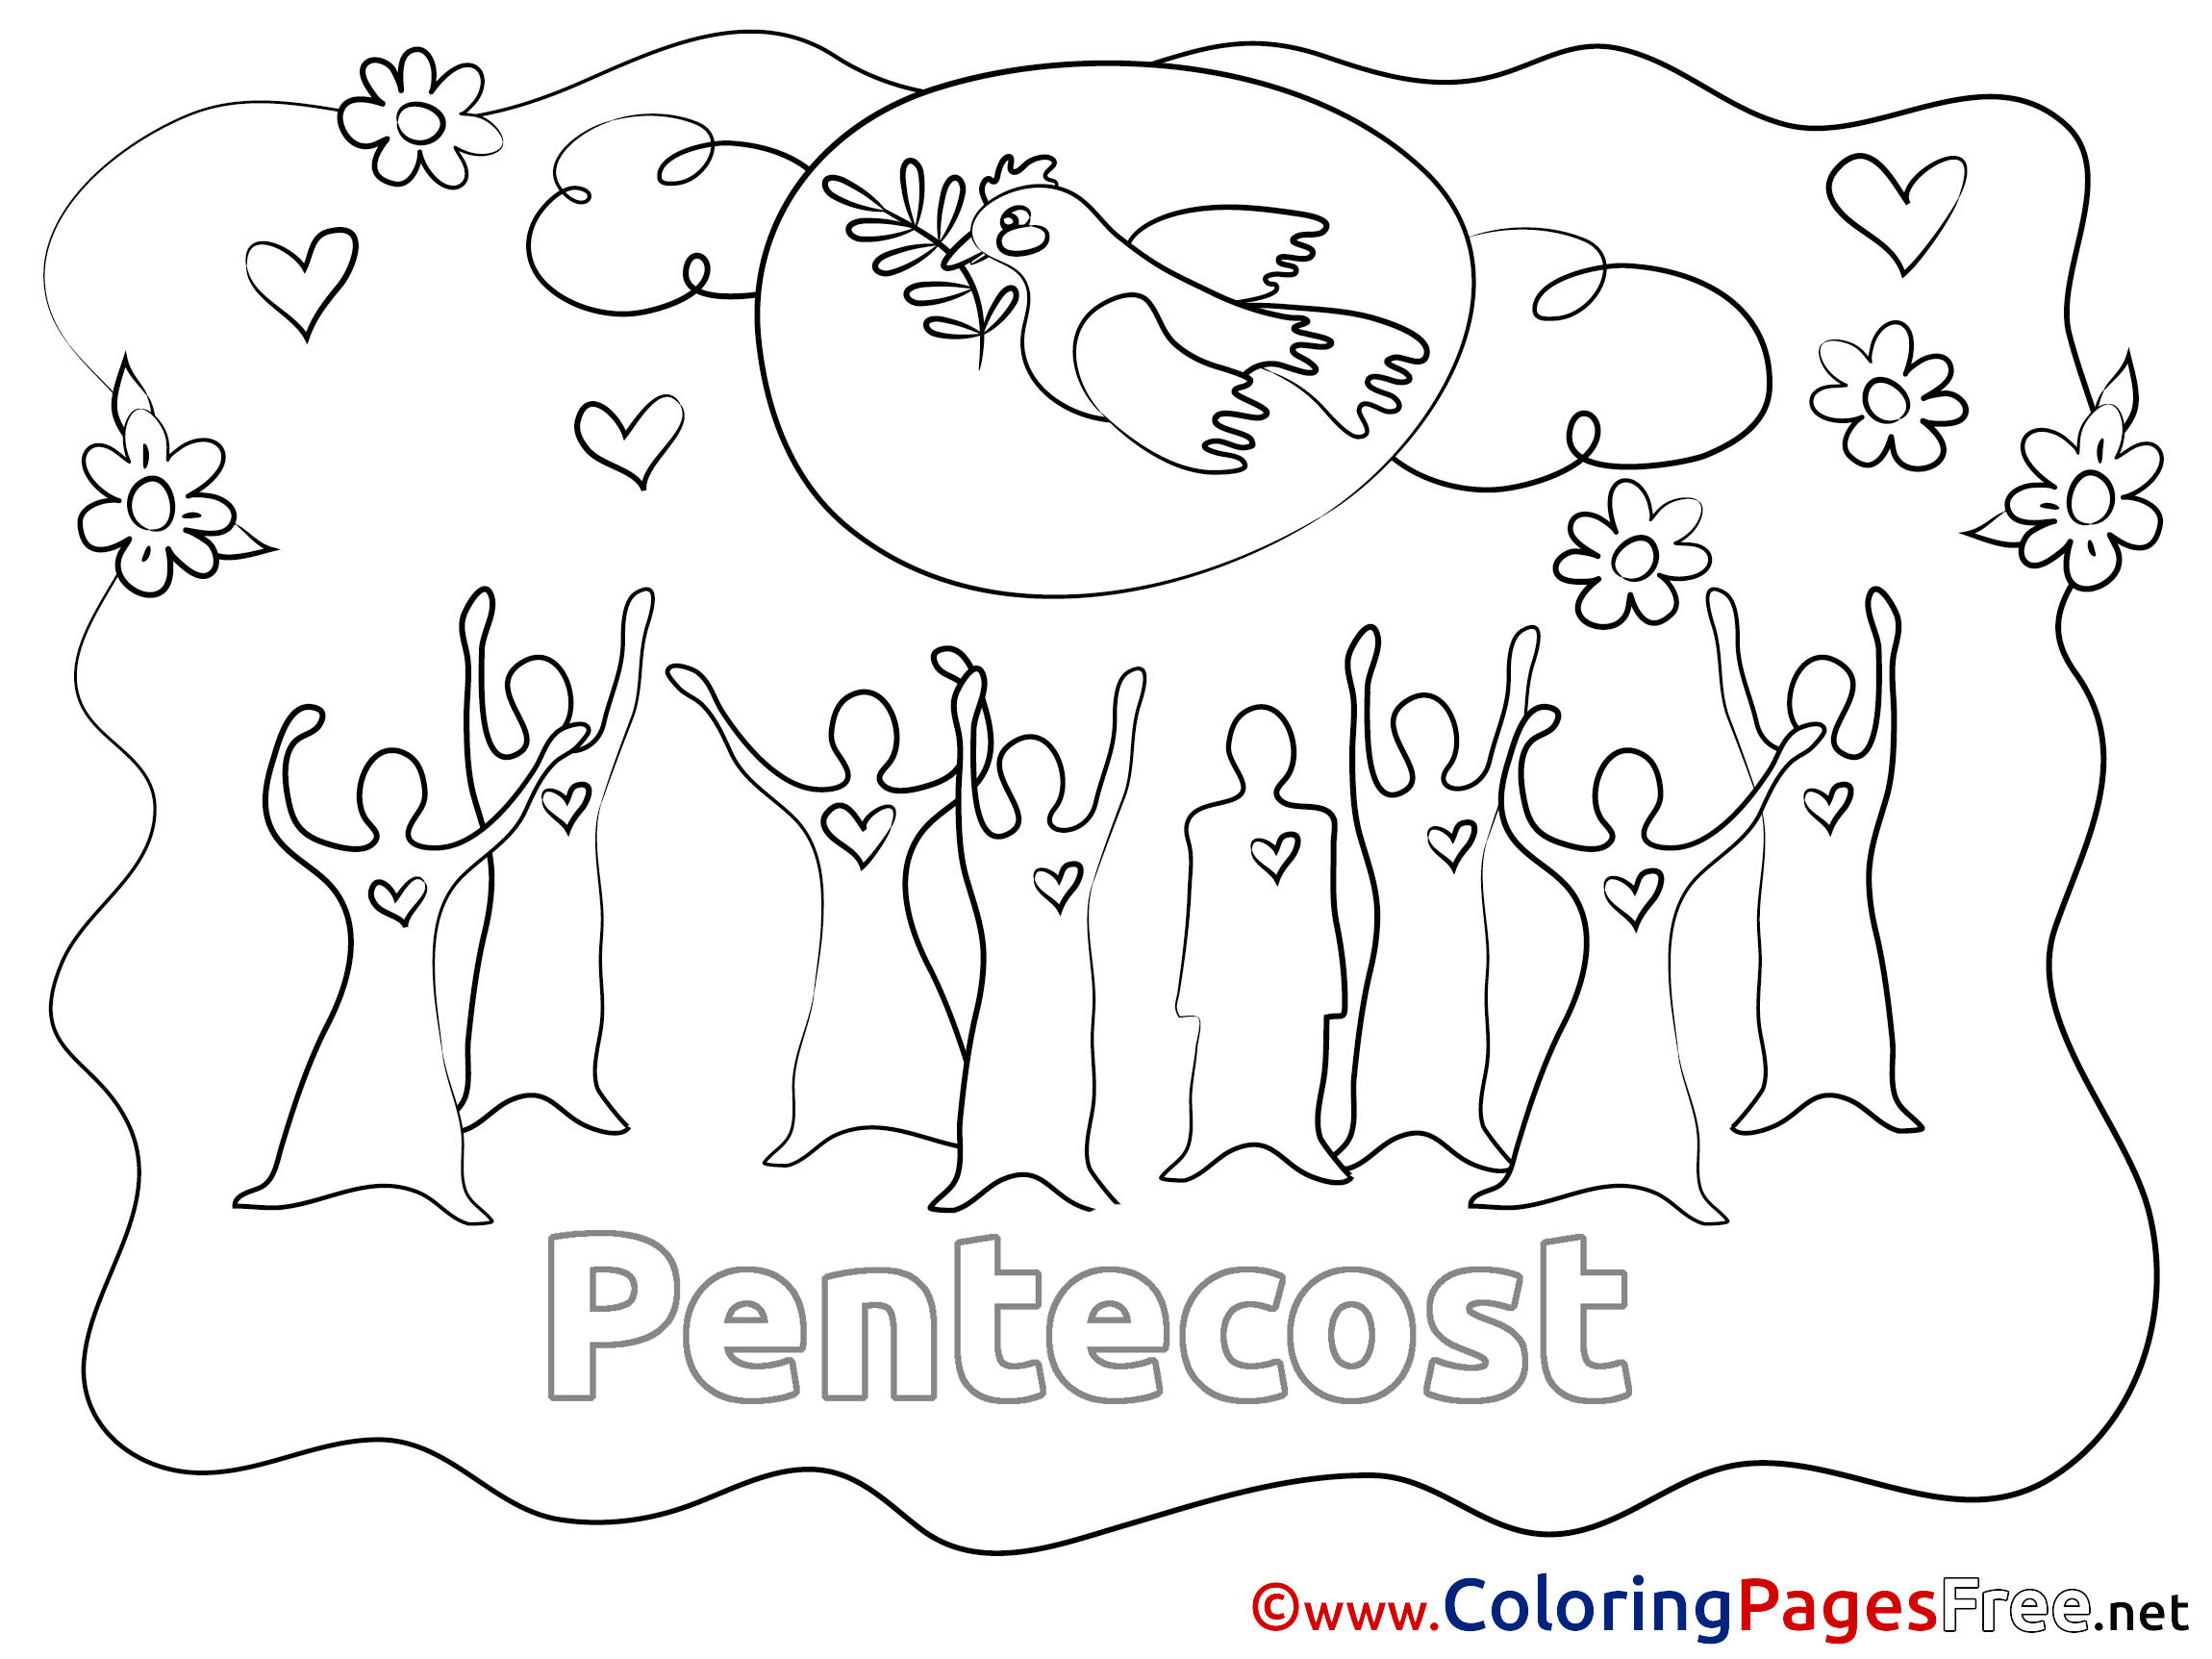 pentecost coloring pages contegri com